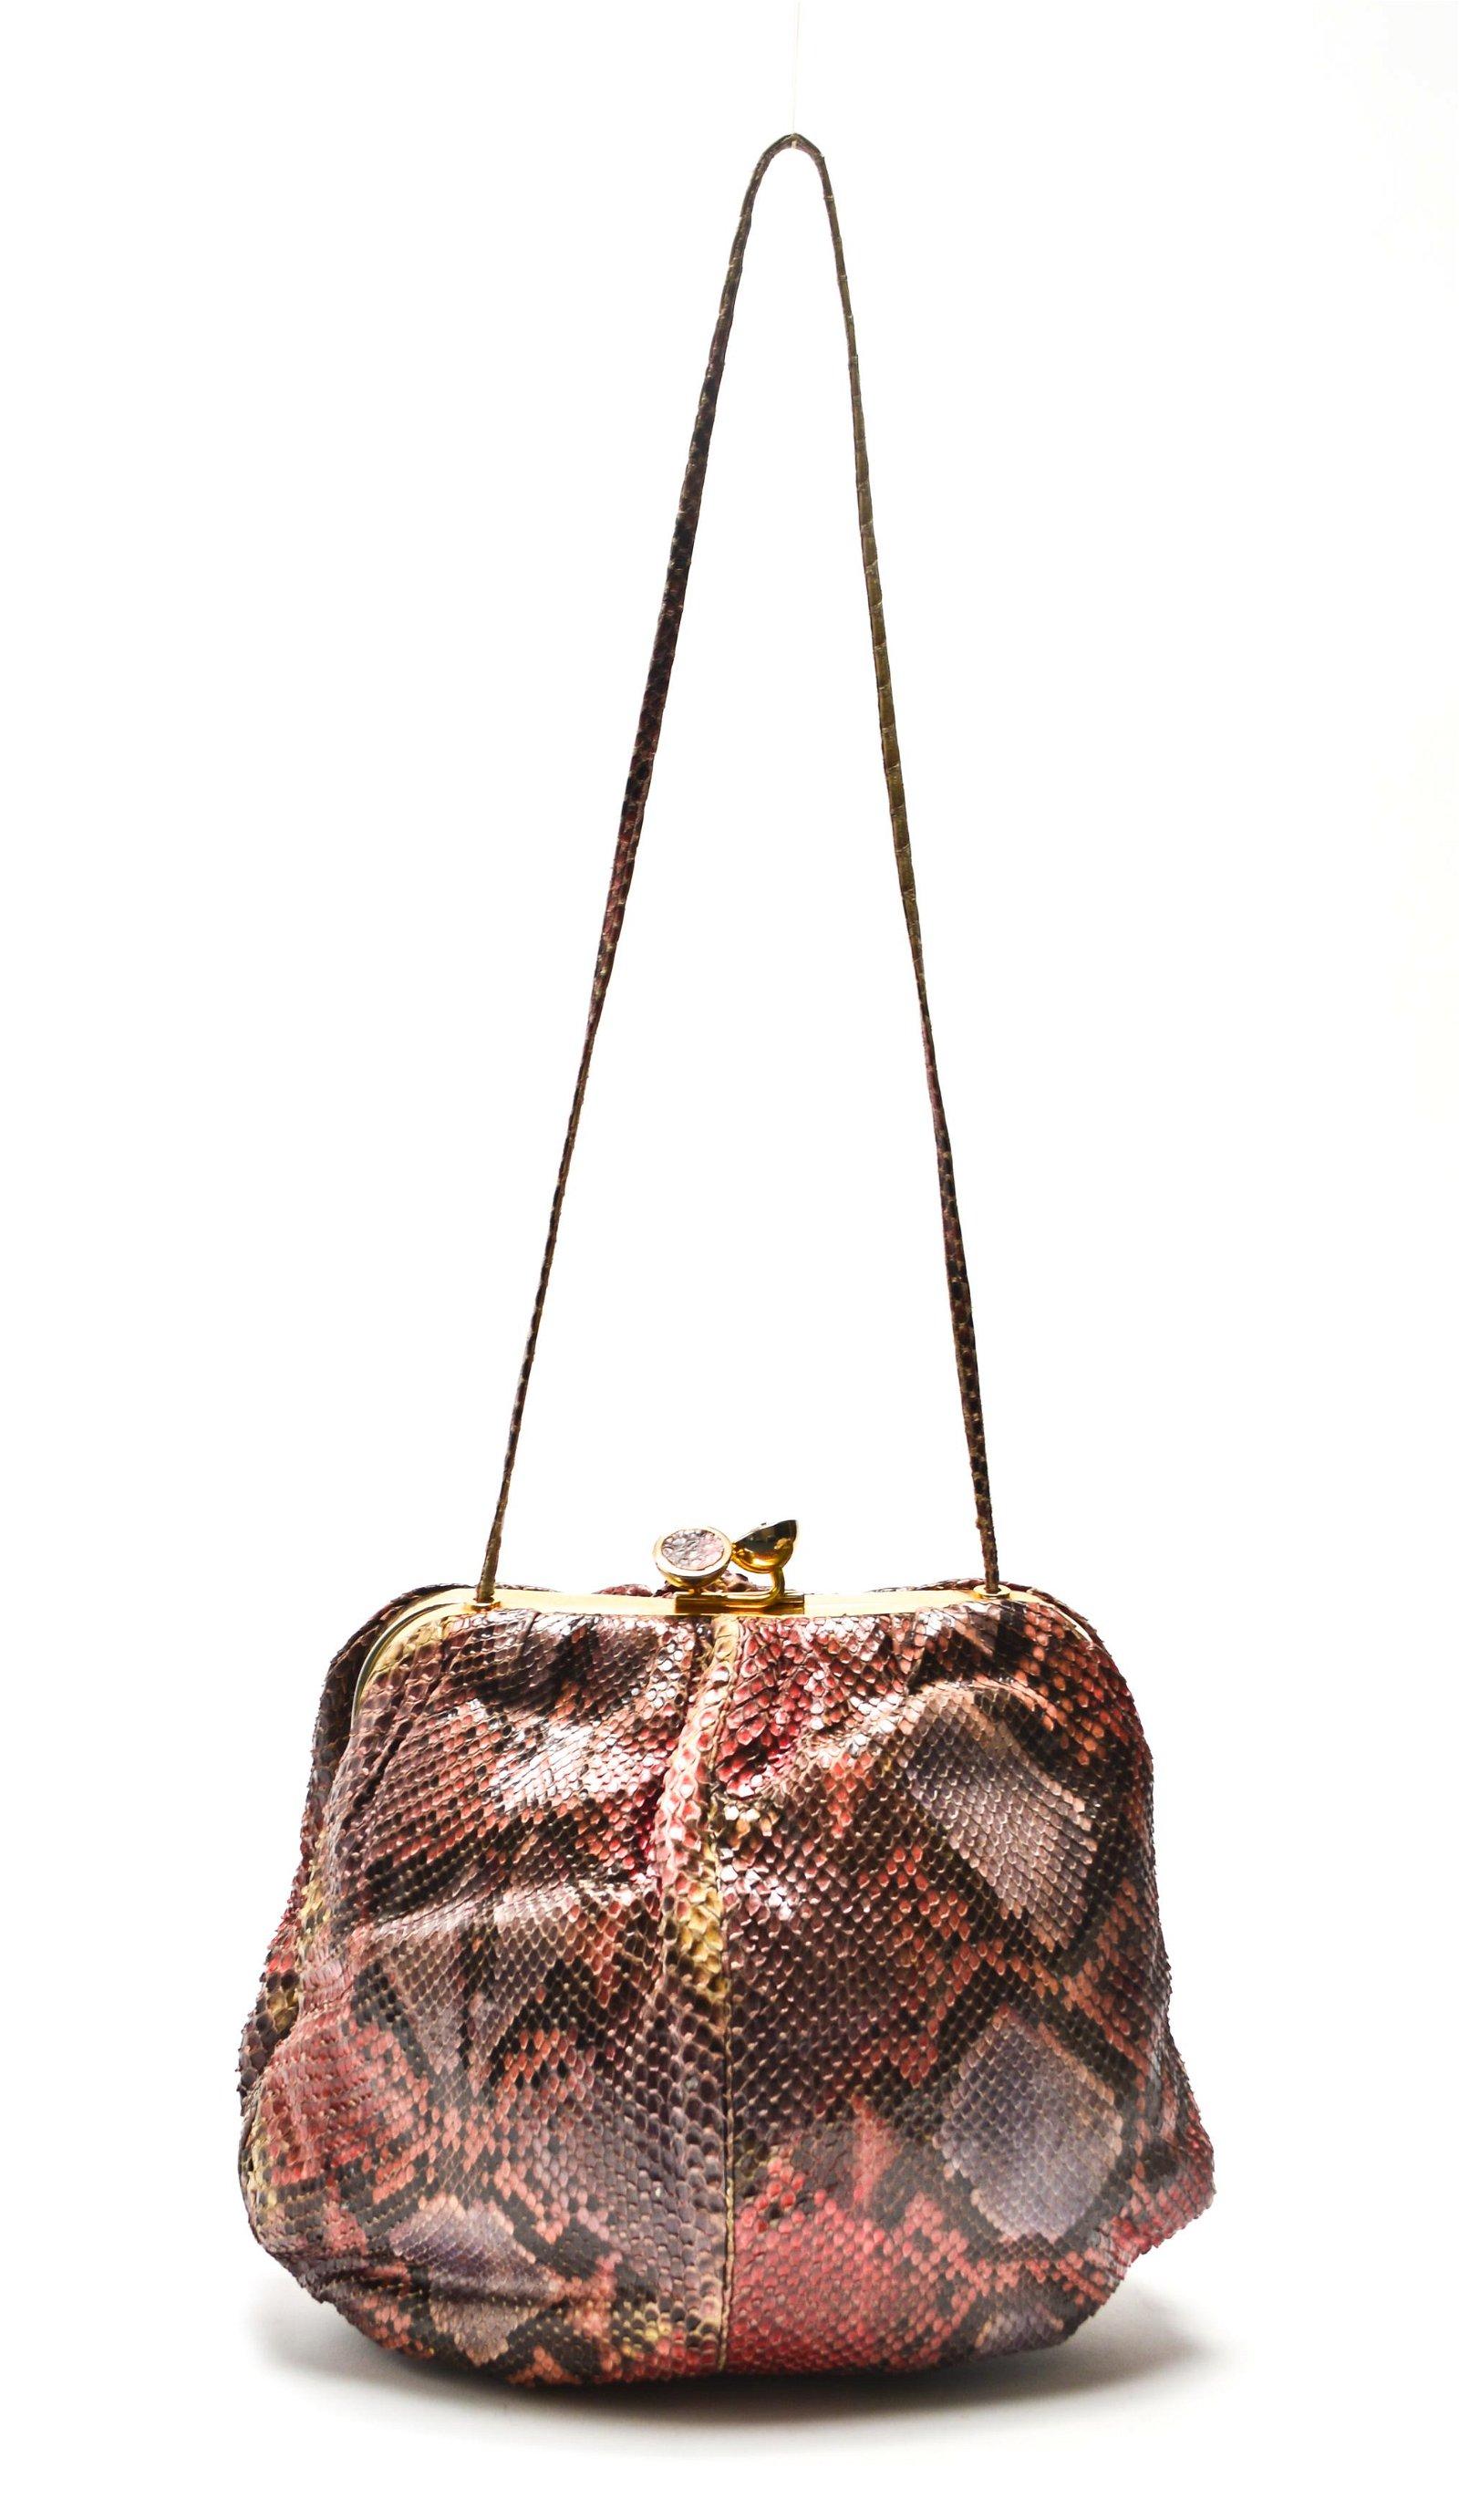 Judith Leiber Vintage Snakeskin Purse